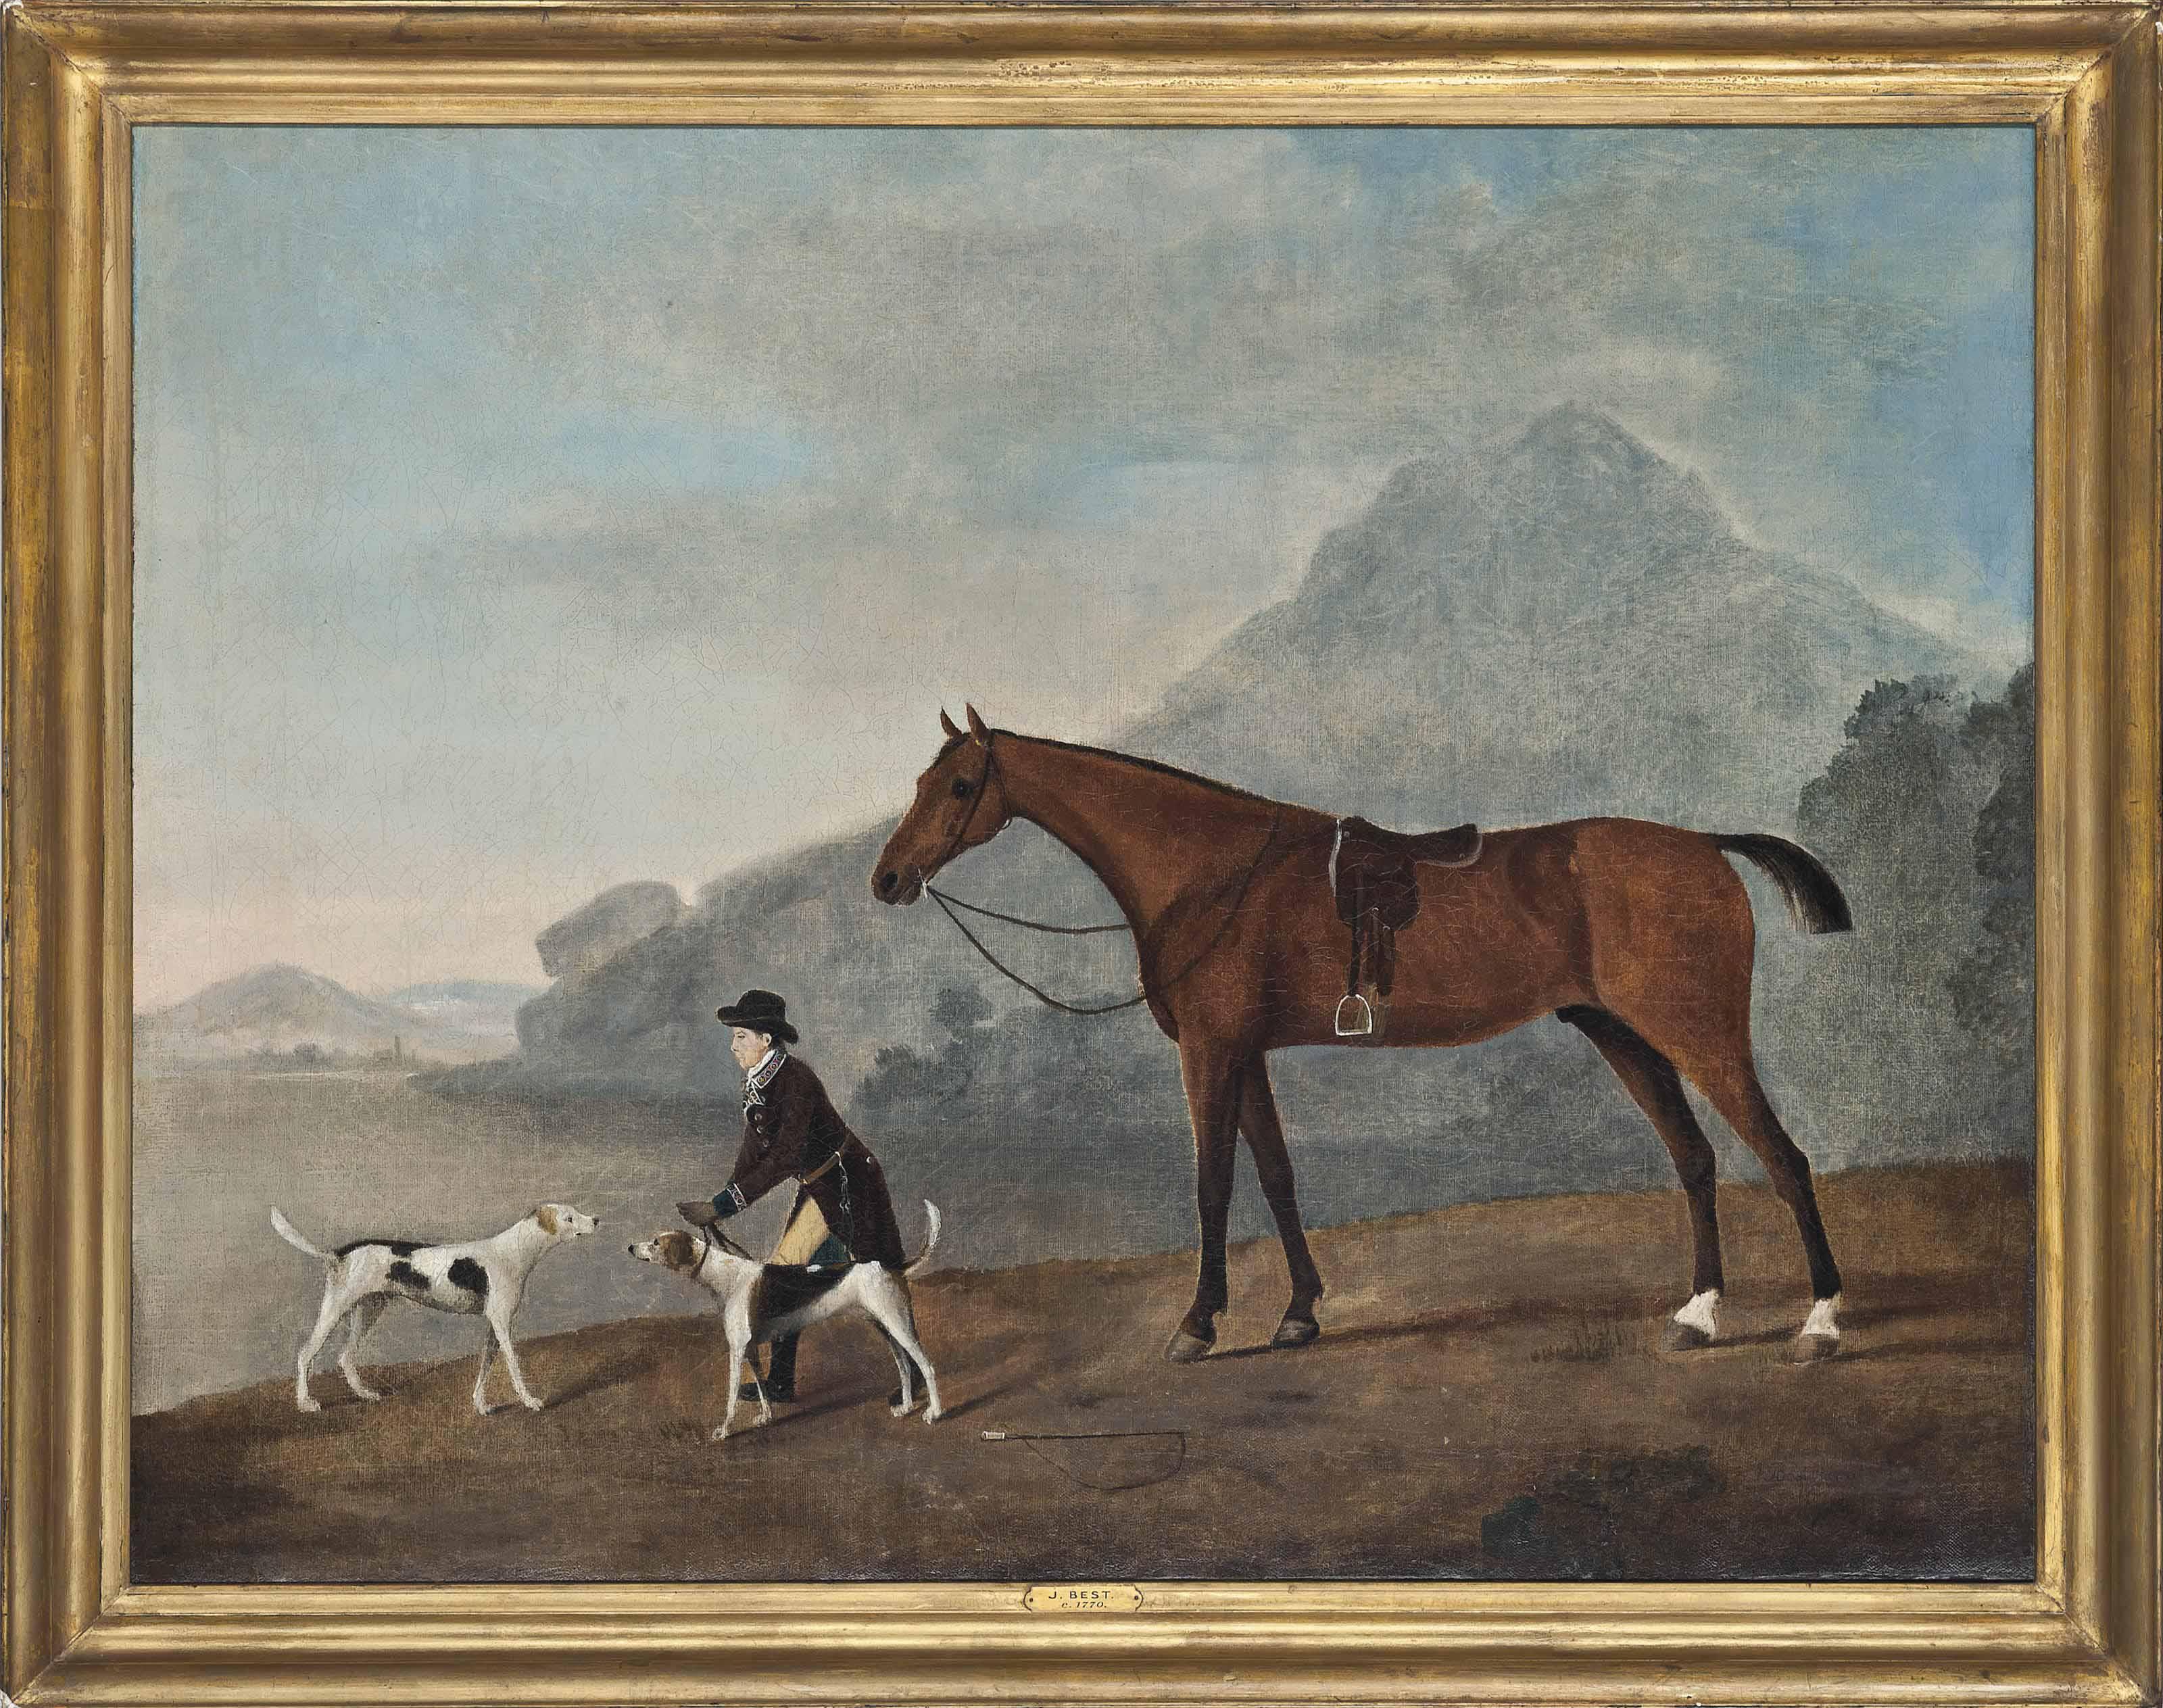 John Best (British, fl. 1750-1792)